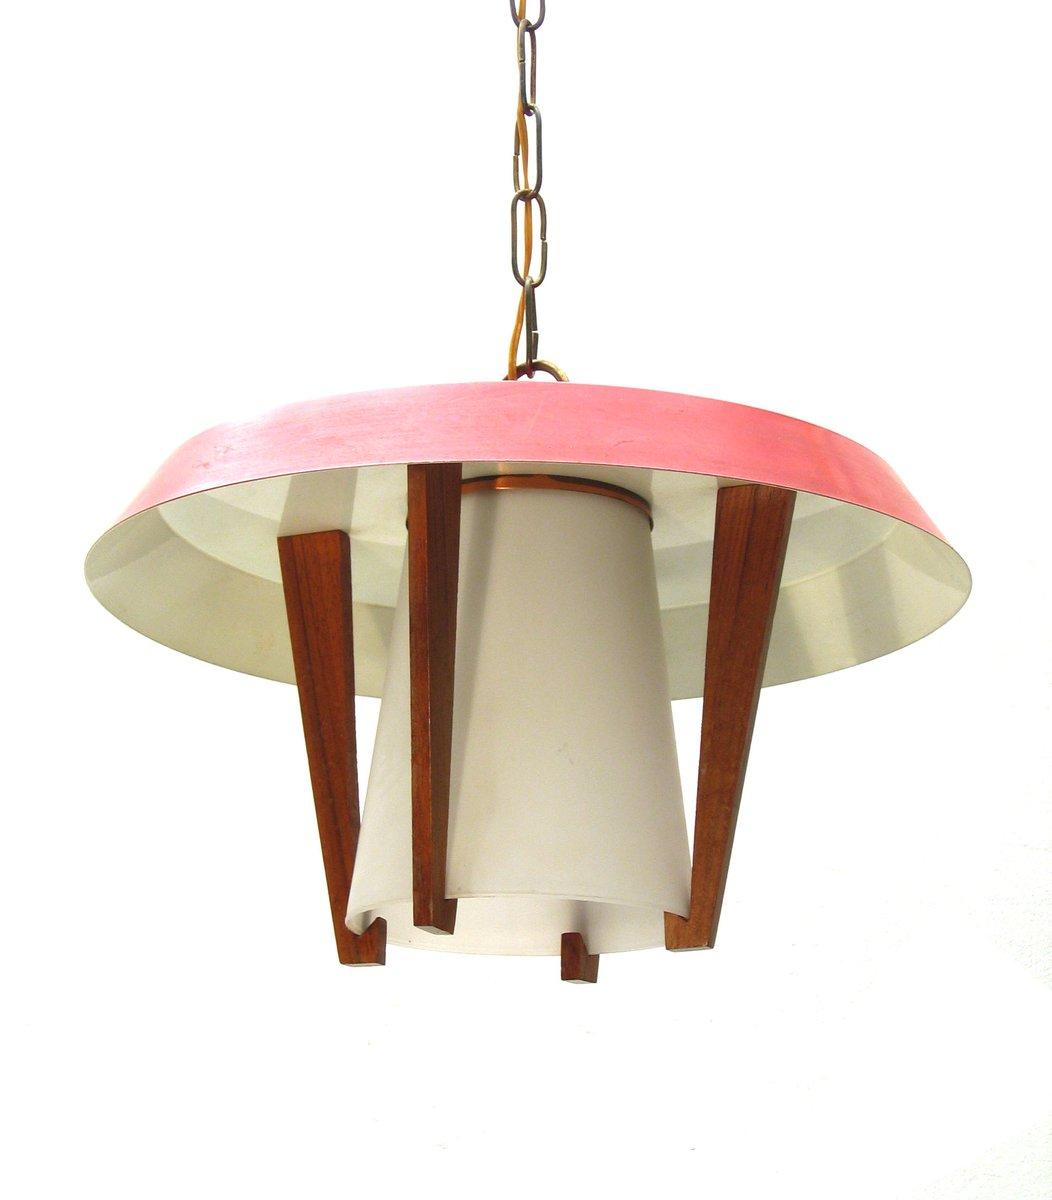 vintage h ngelampe aus metall holz und glas 1950er bei pamono kaufen. Black Bedroom Furniture Sets. Home Design Ideas